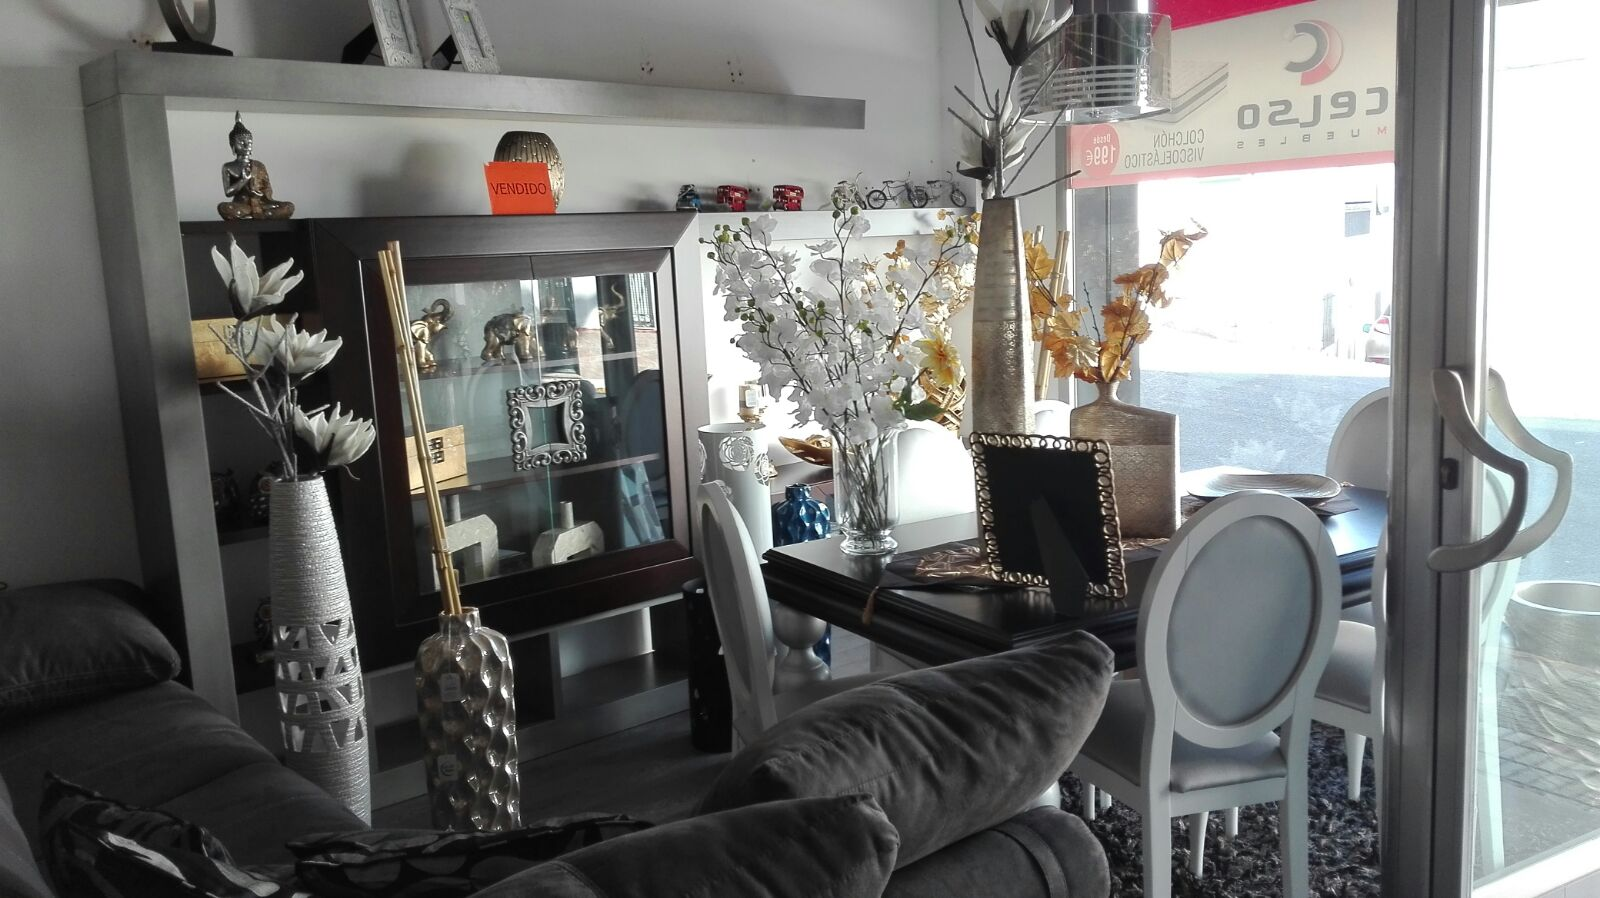 Muebles Celso Santo Tom Applicaja N # Muebles Celso Santo Tome